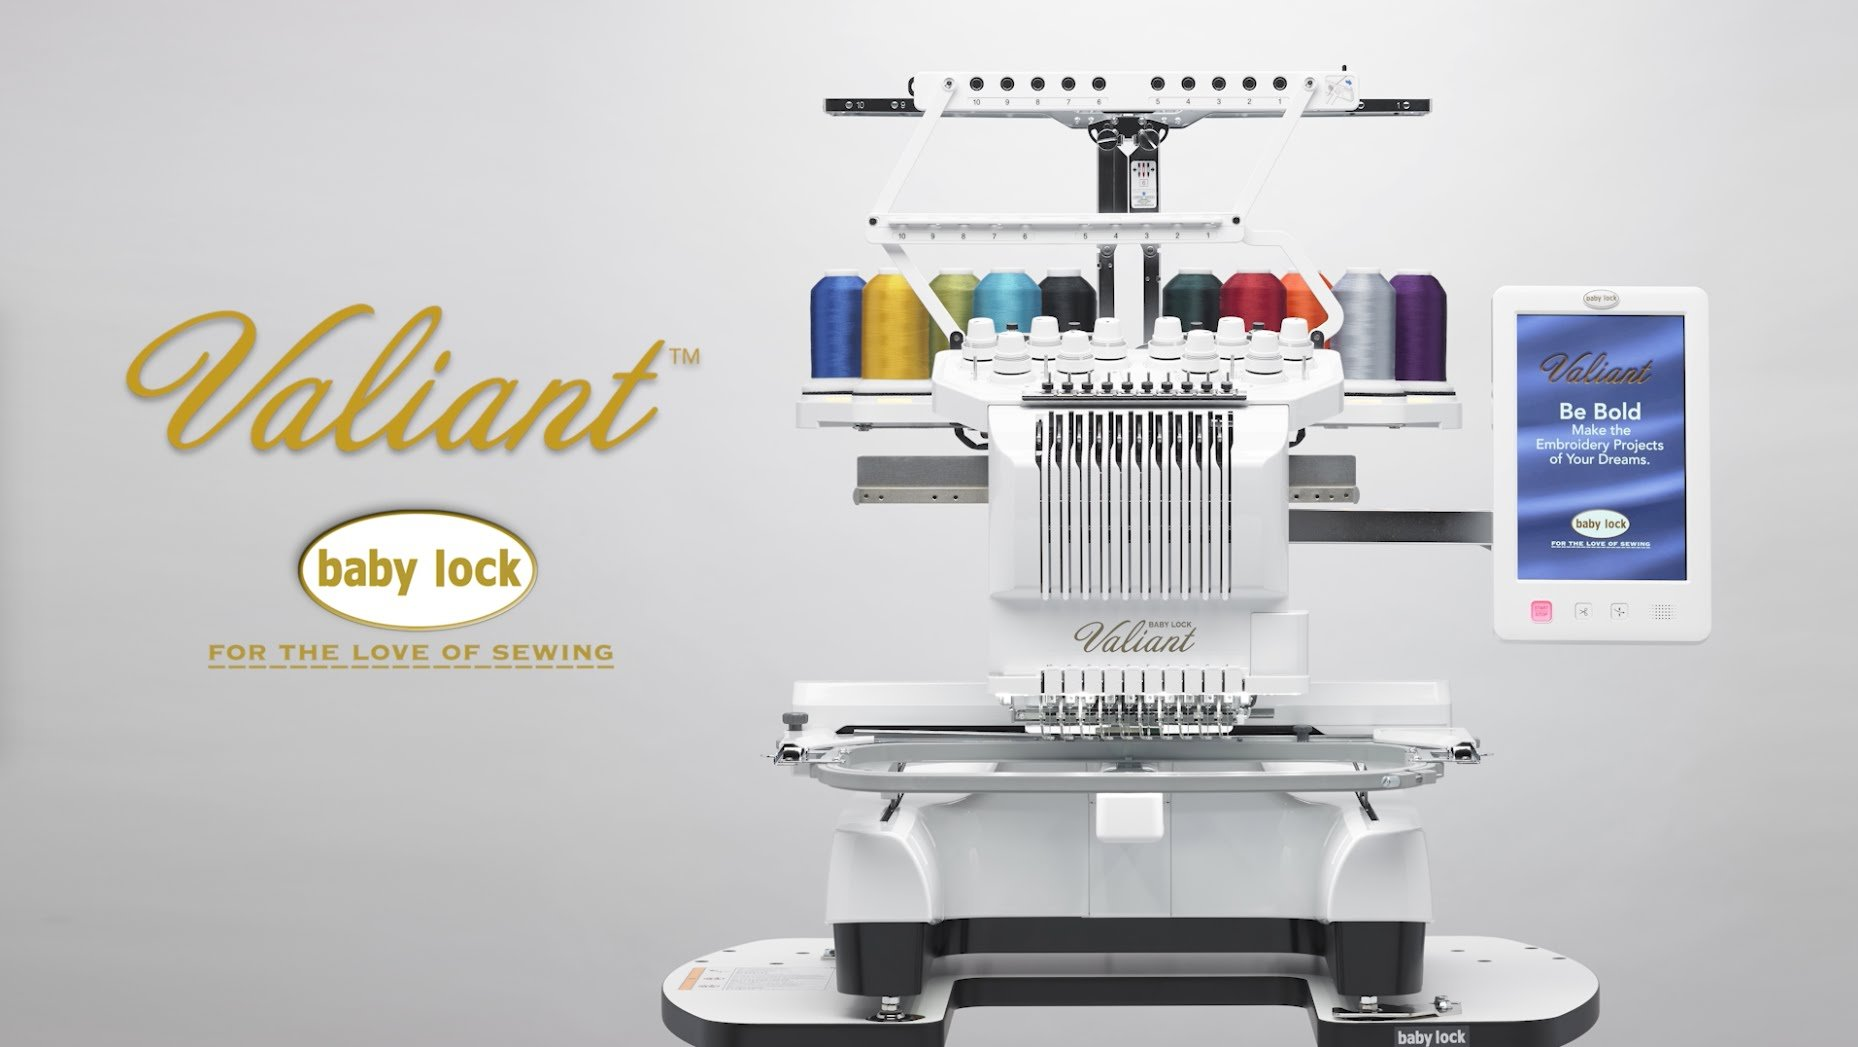 Baby Lock Valiant 10 Needle Professional Embroidery Machine